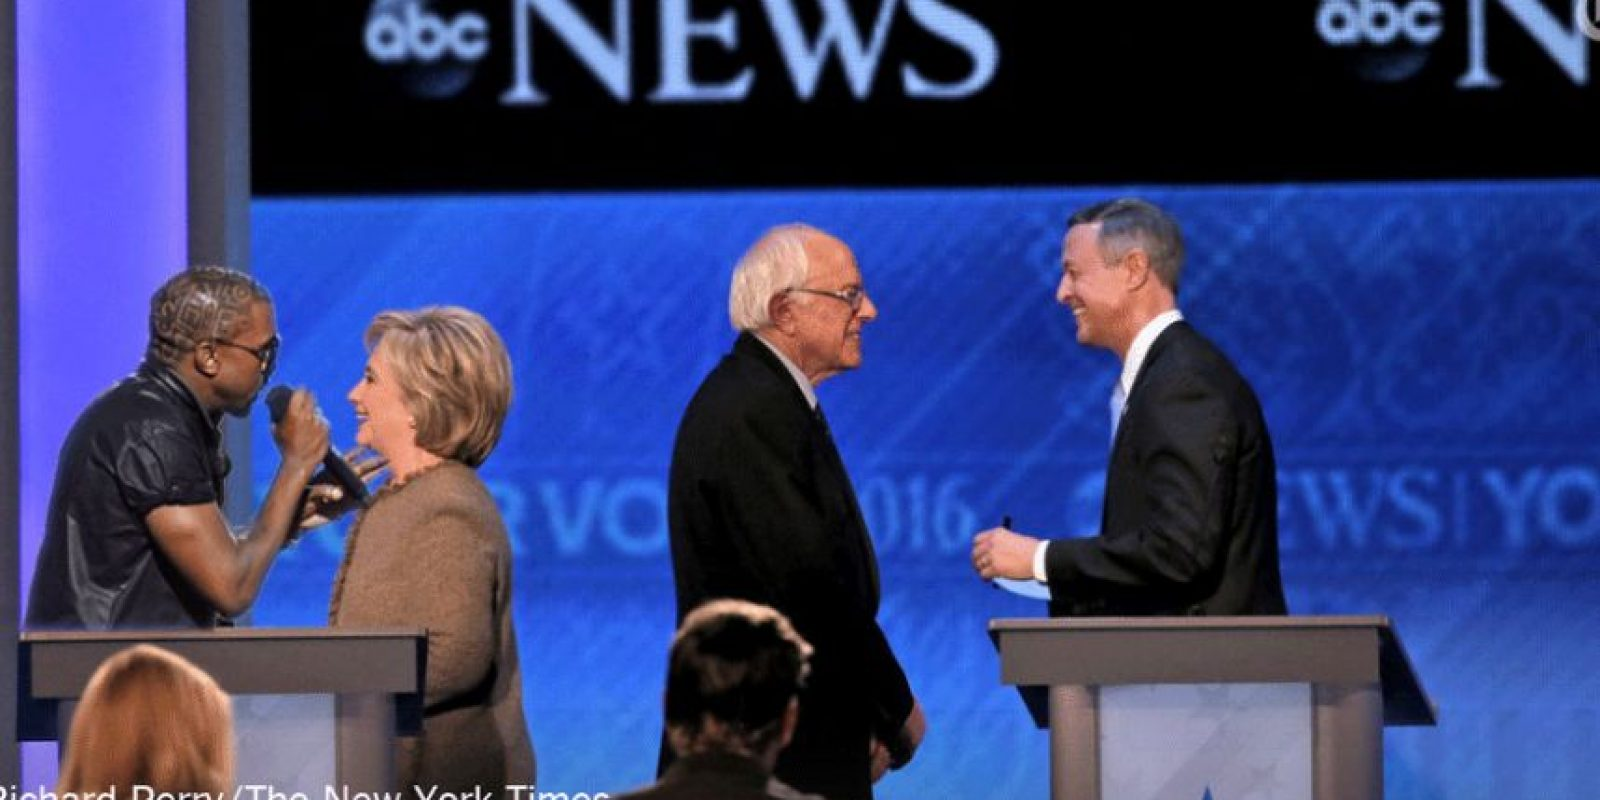 Se rieron de la imagen de Hillary hablando sola Foto:Imgur / Reddit